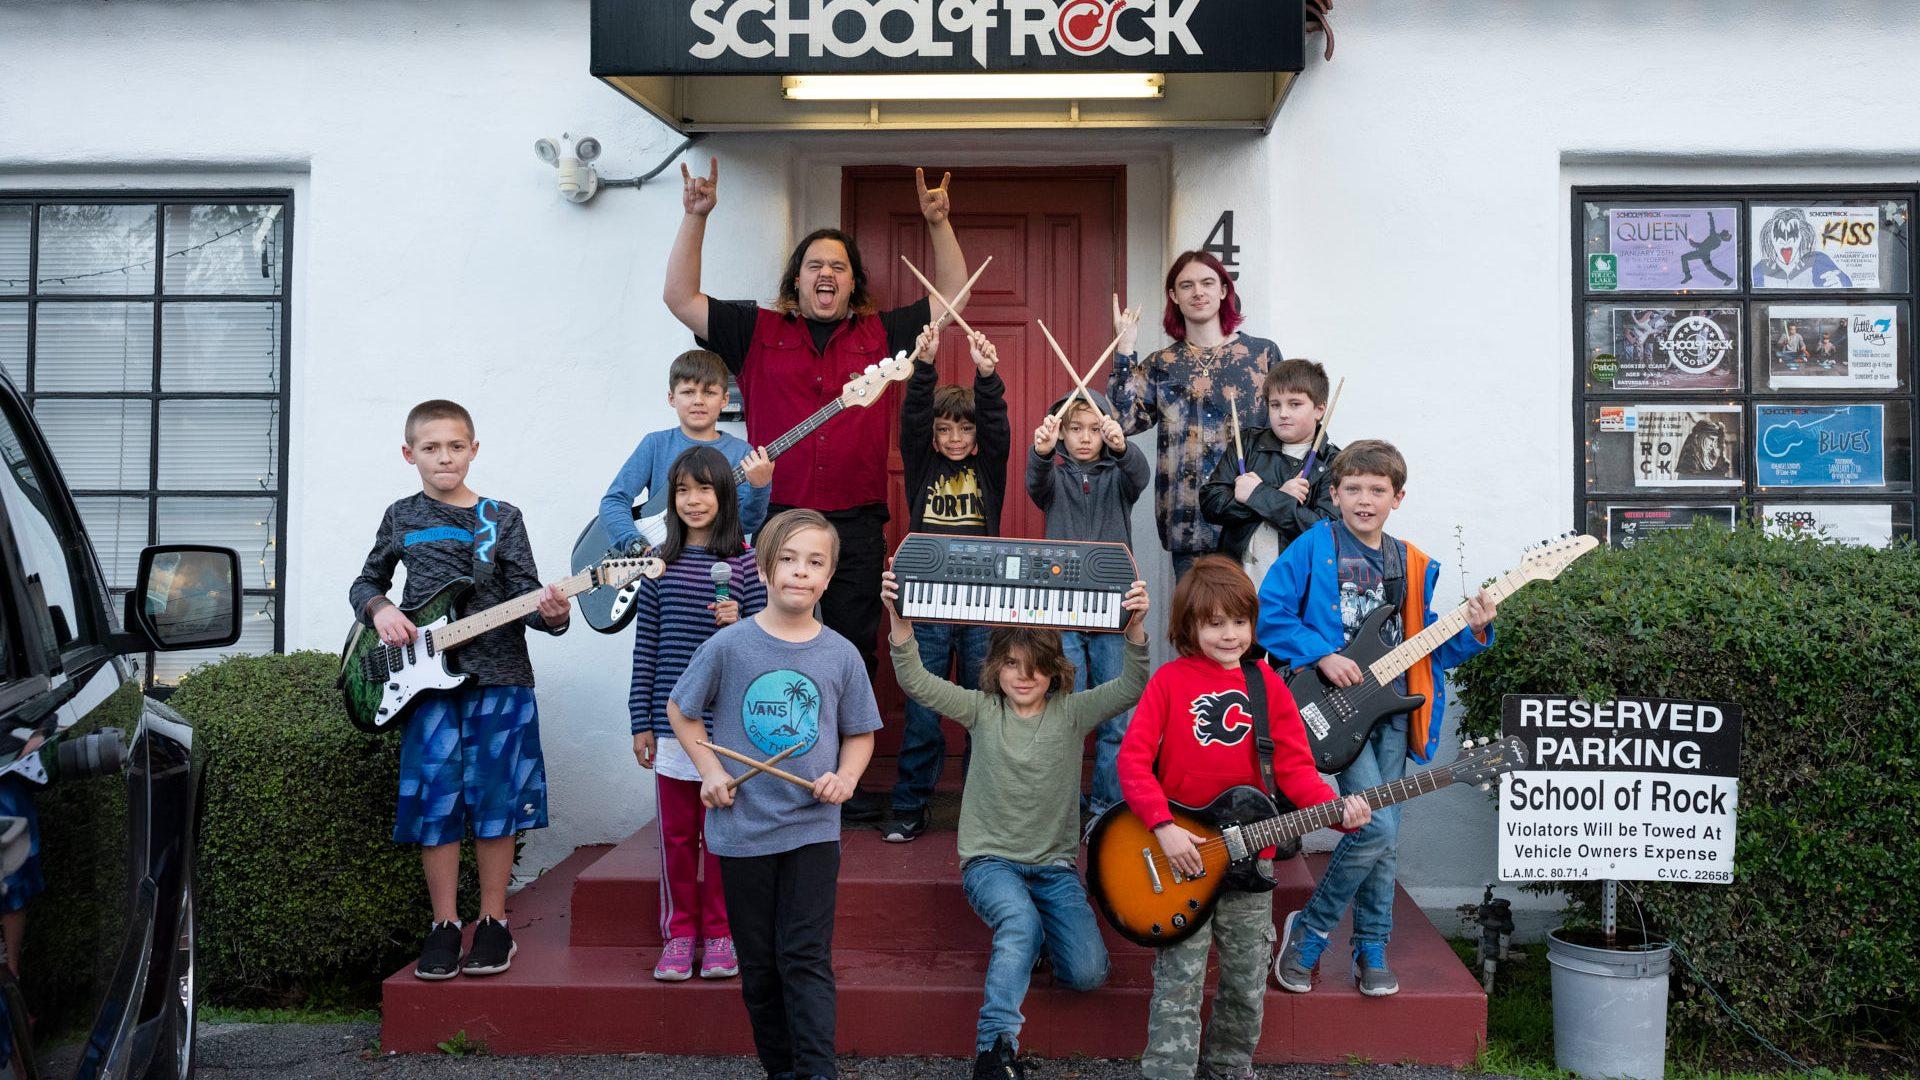 School of Rock Teaches the Universal Language of Music